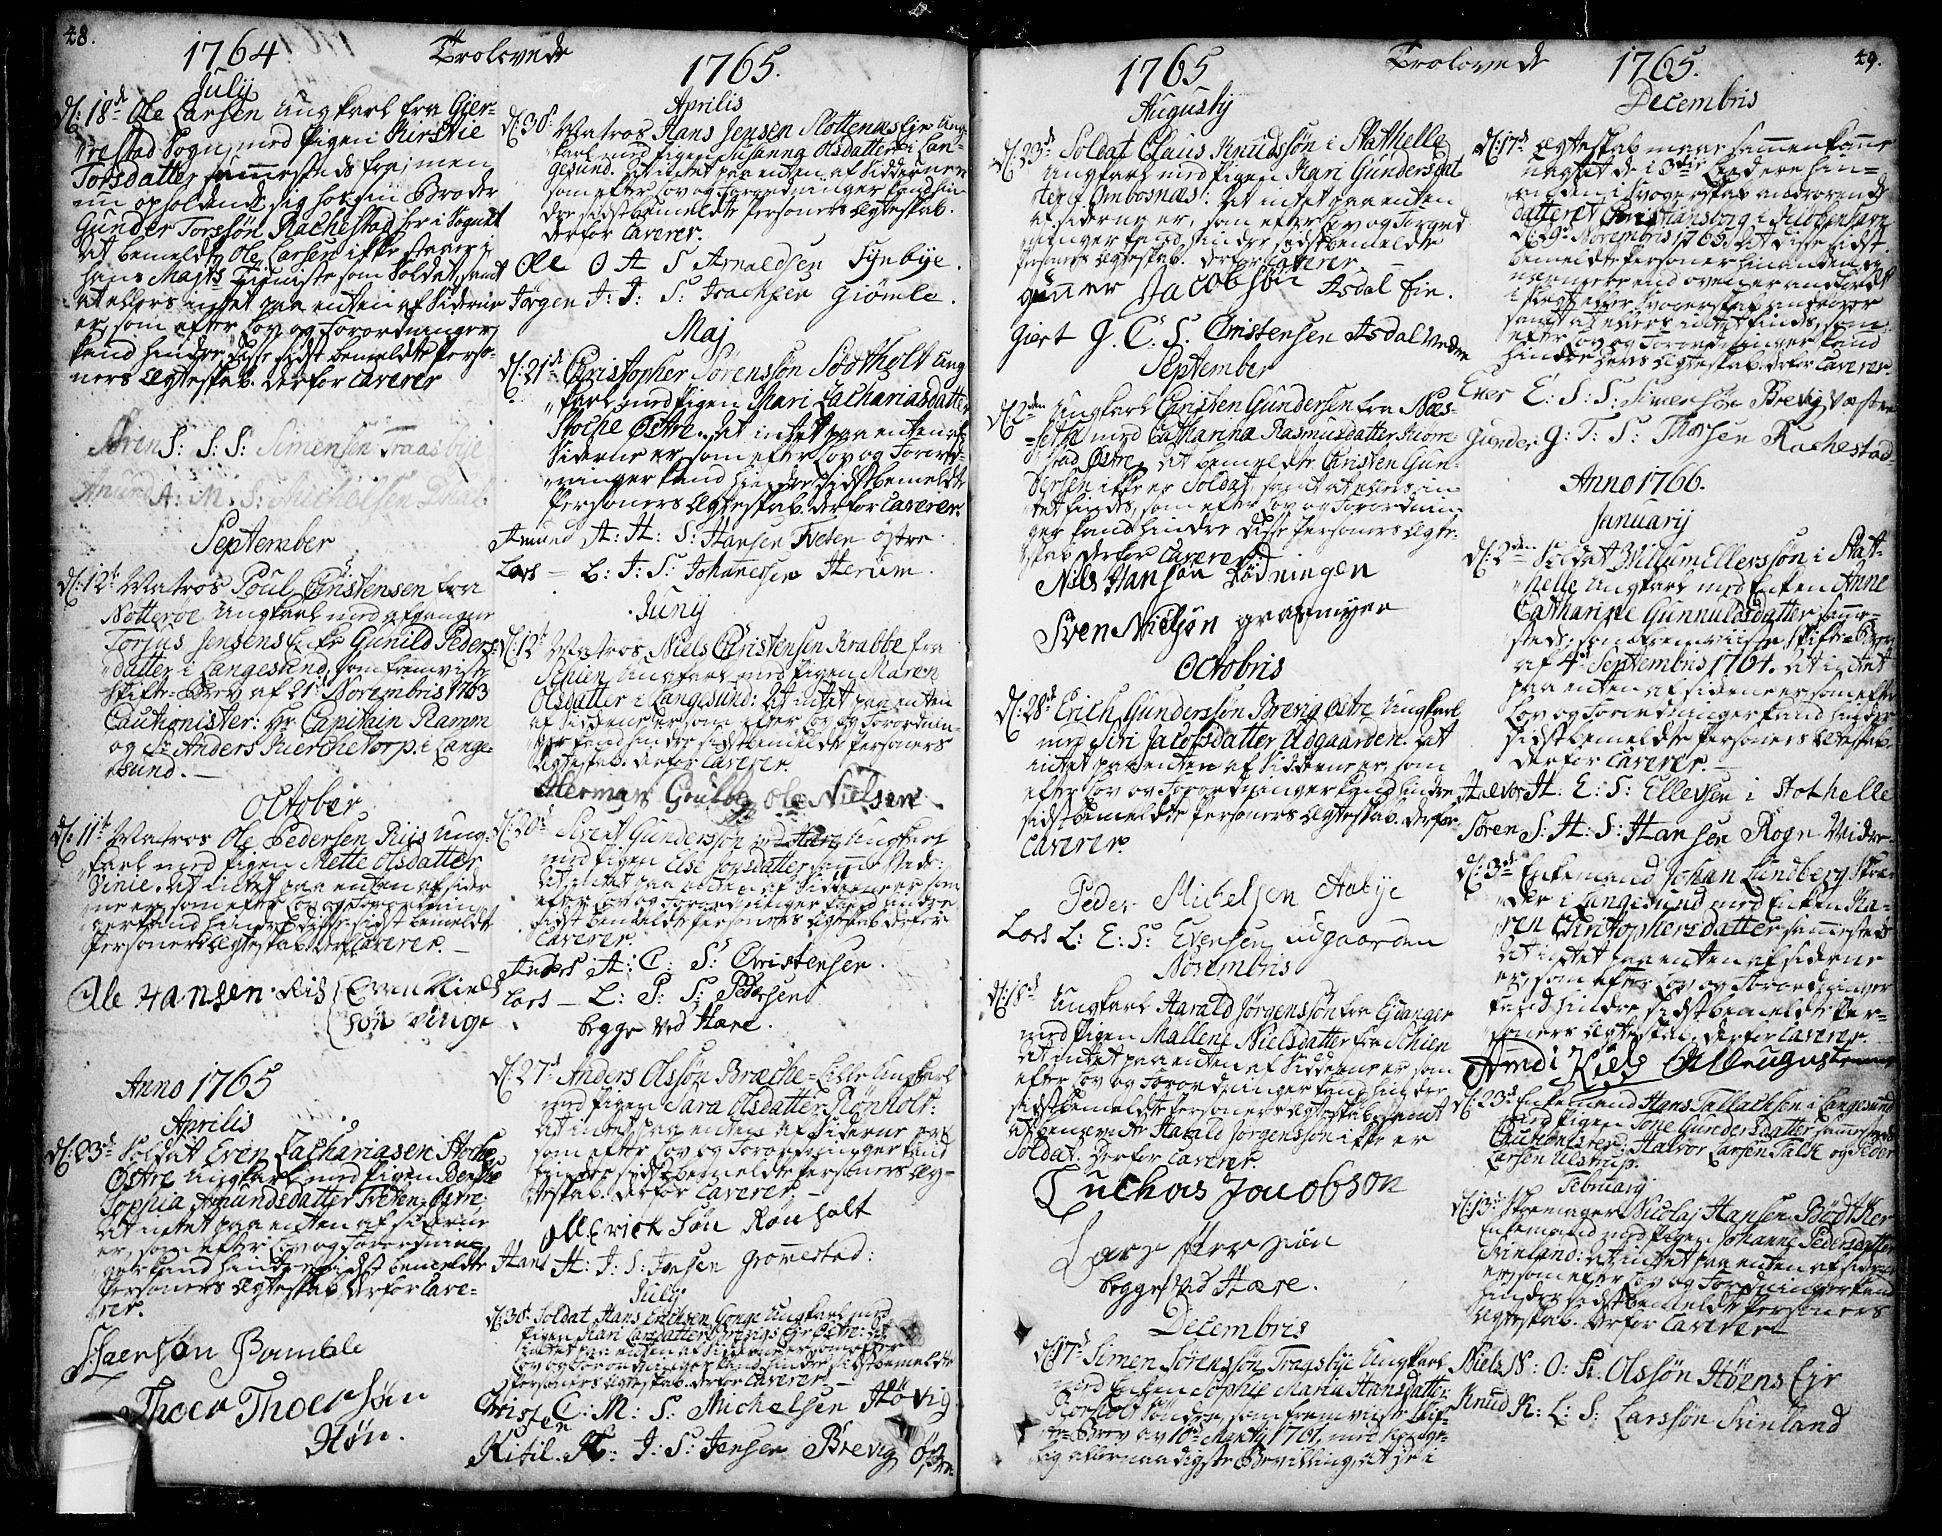 SAKO, Bamble kirkebøker, F/Fa/L0001: Ministerialbok nr. I 1, 1702-1774, s. 48-49